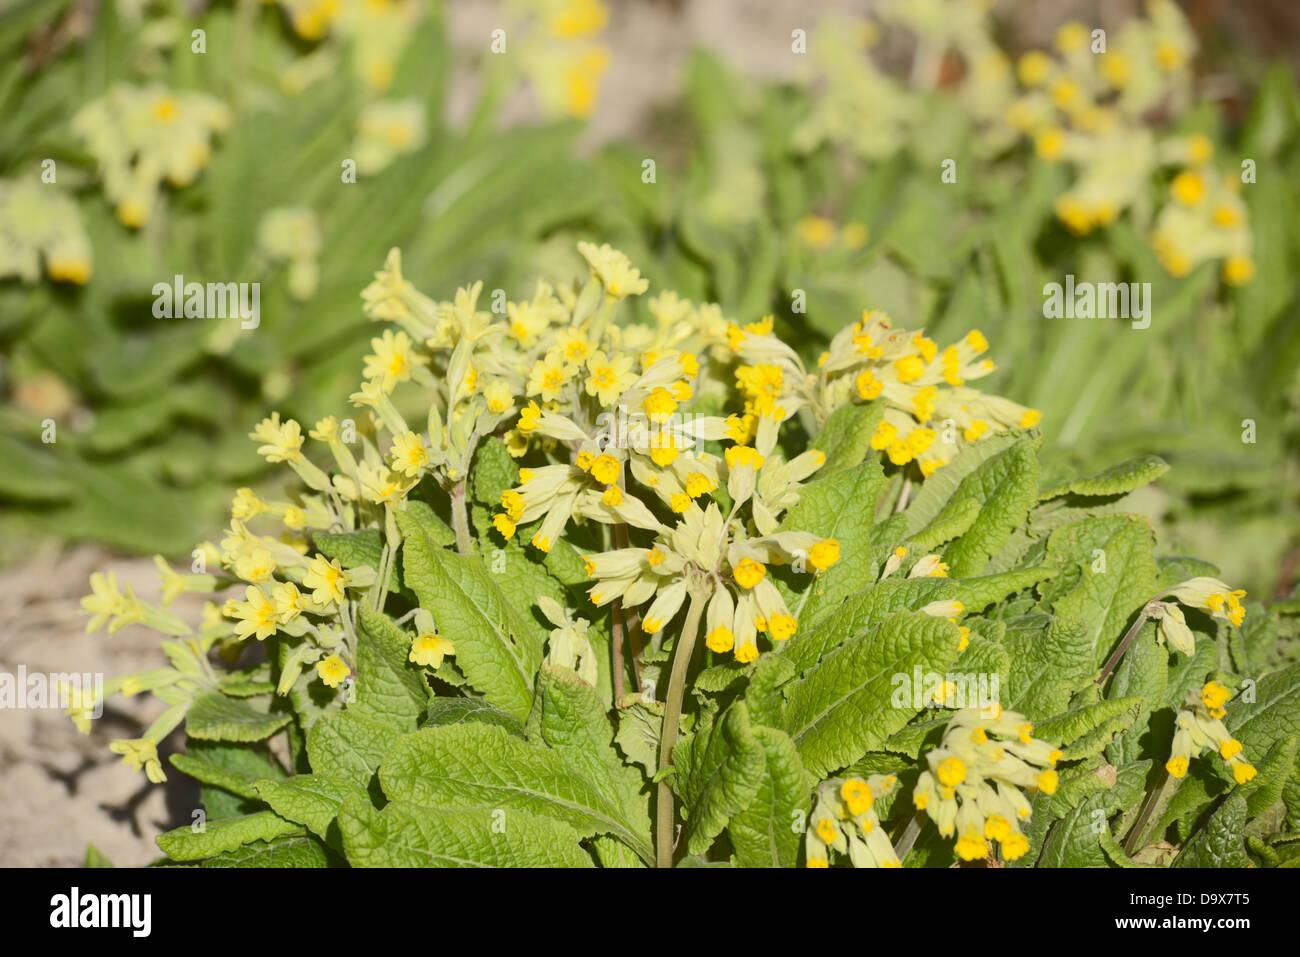 Primula veris, Cowslip flowers, Wales, UK. Stock Photo